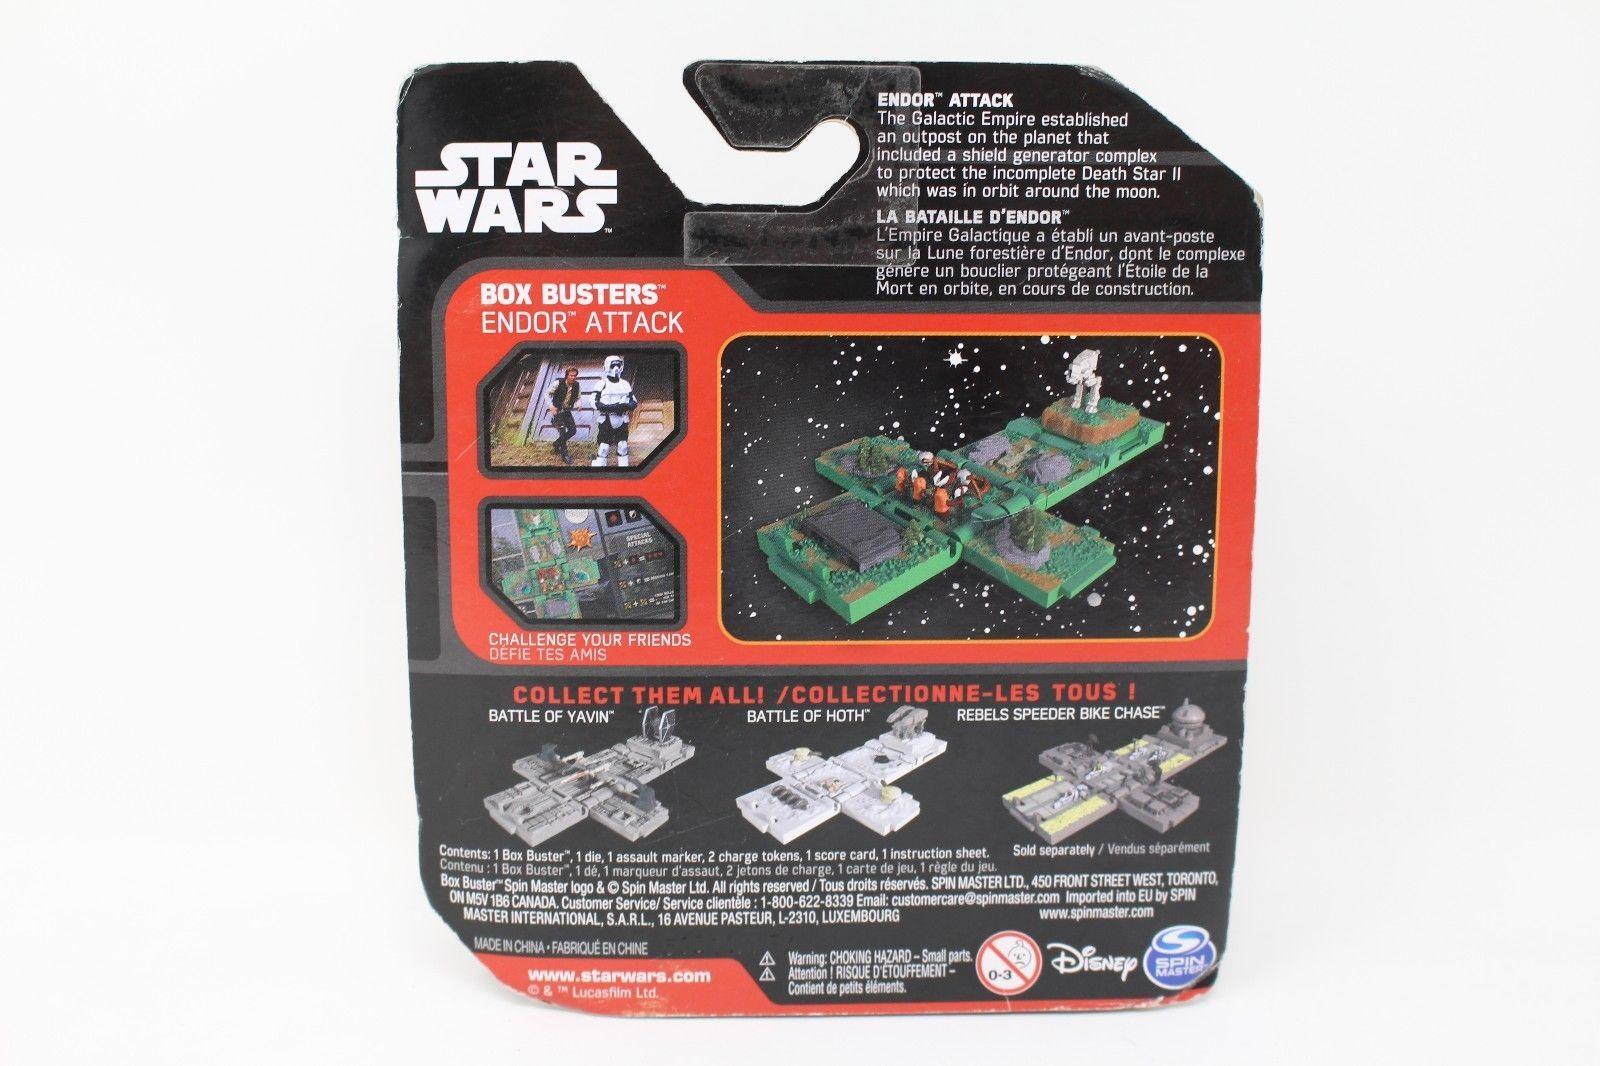 Battle of Hoth And Battle Of Yavin NIB Lot Of 2 Star Wars Disney Box Busters